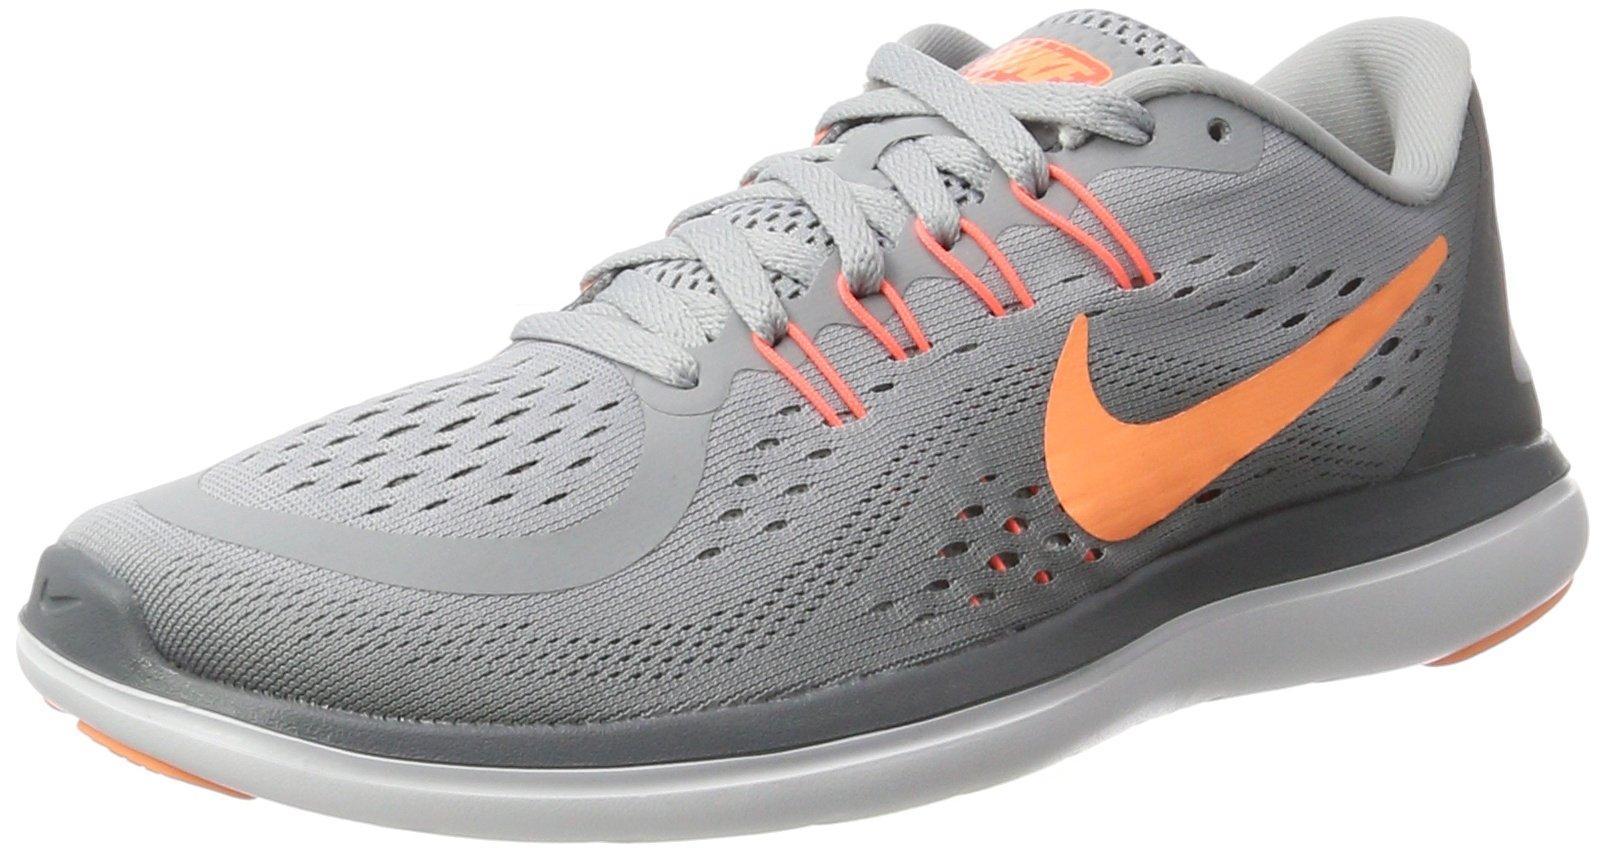 c720a8fef81 Galleon - Nike Flex 2017 RN Womens Running Shoes (9 B(M) US)